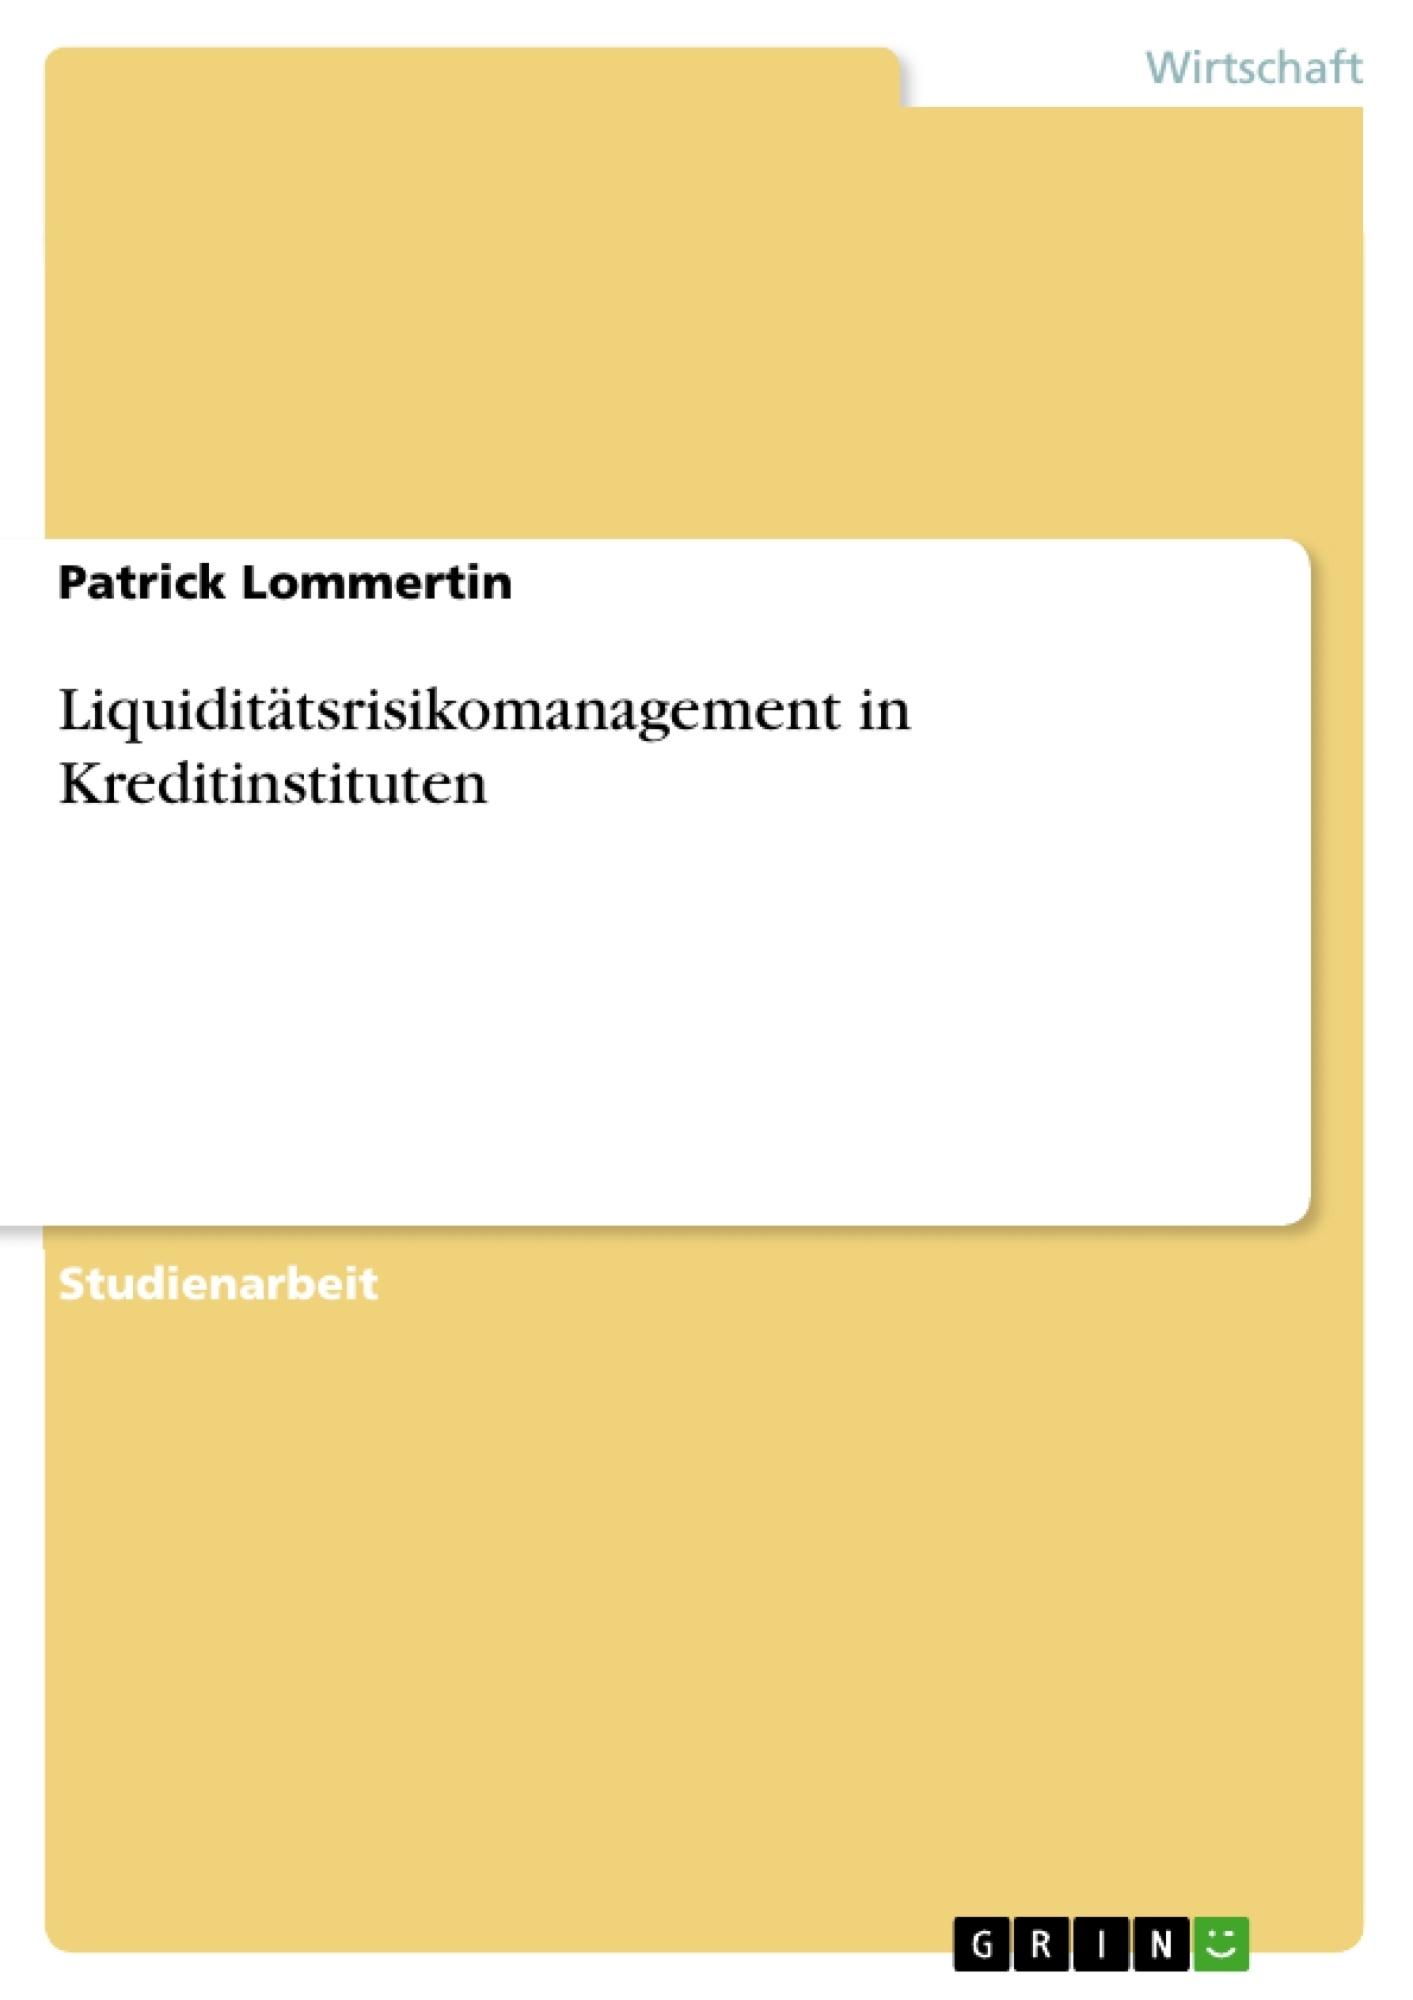 Titel: Liquiditätsrisikomanagement in Kreditinstituten